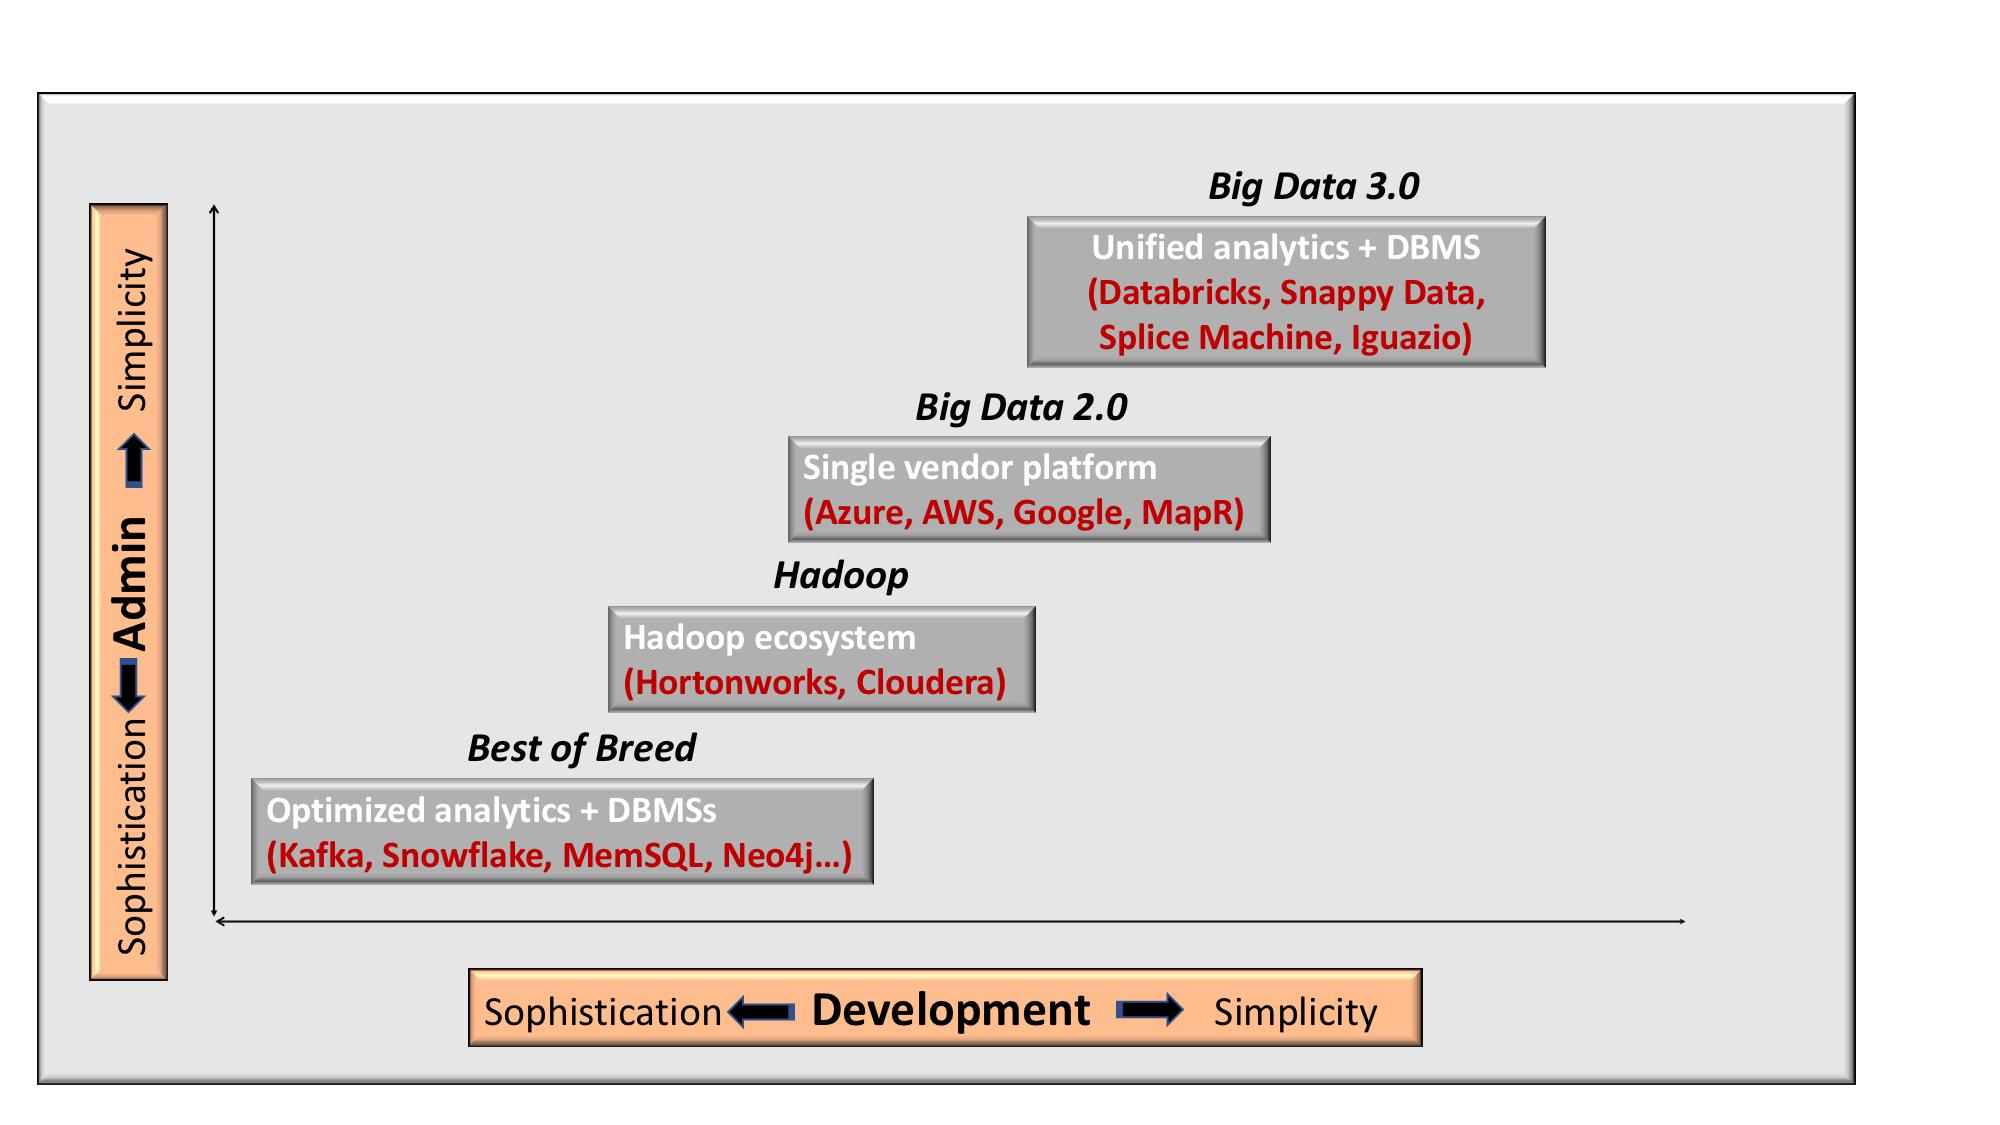 Databricks' Delta highlights the need for integration to simplify